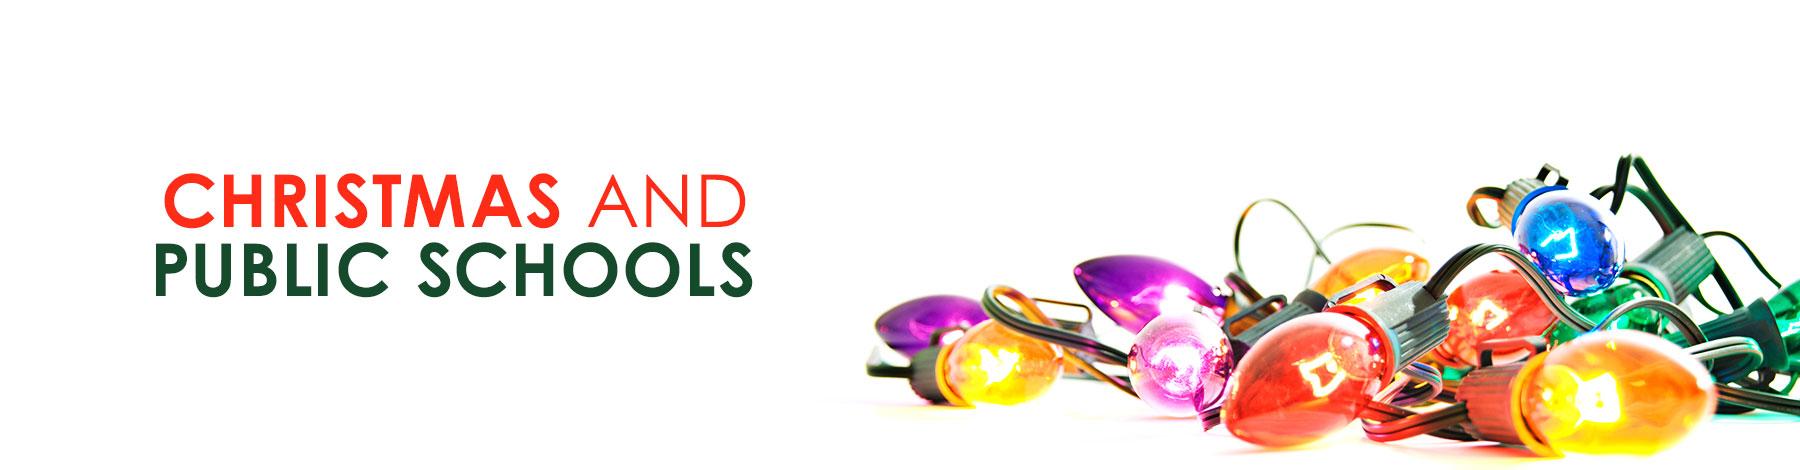 Christmas-and-Public-Schools-Rotator